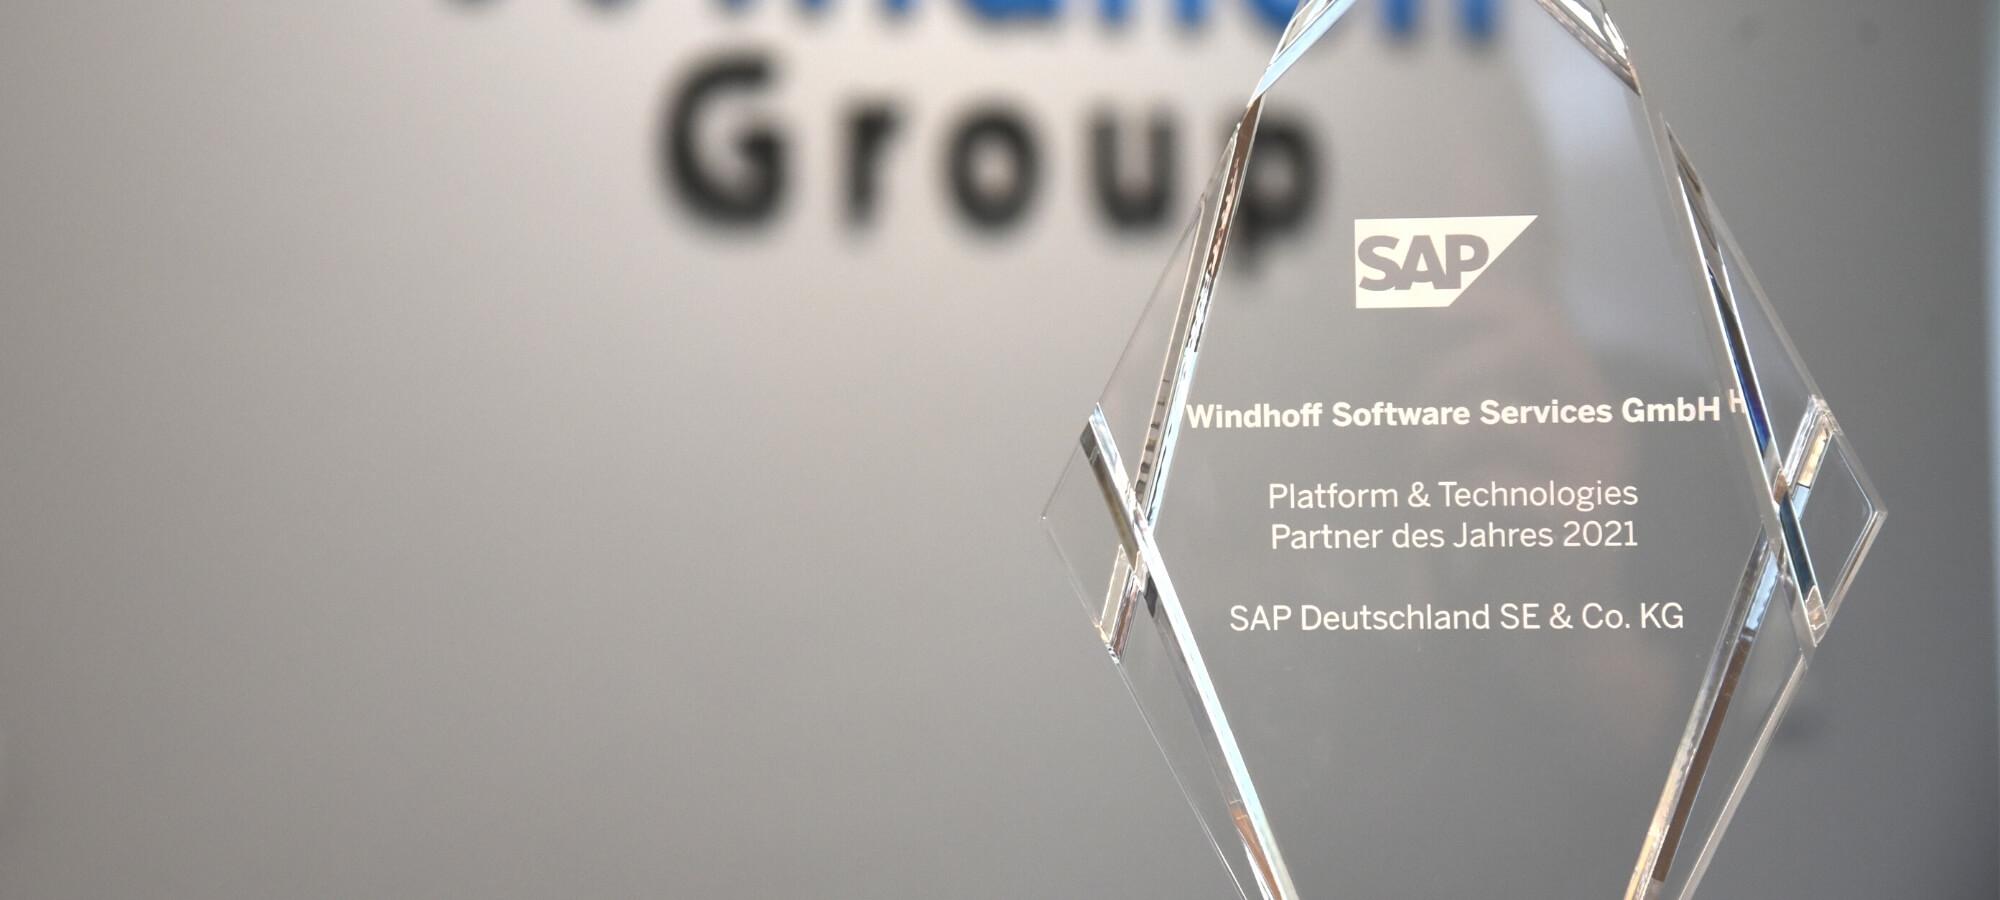 Partner des Jahres Windhoff Group